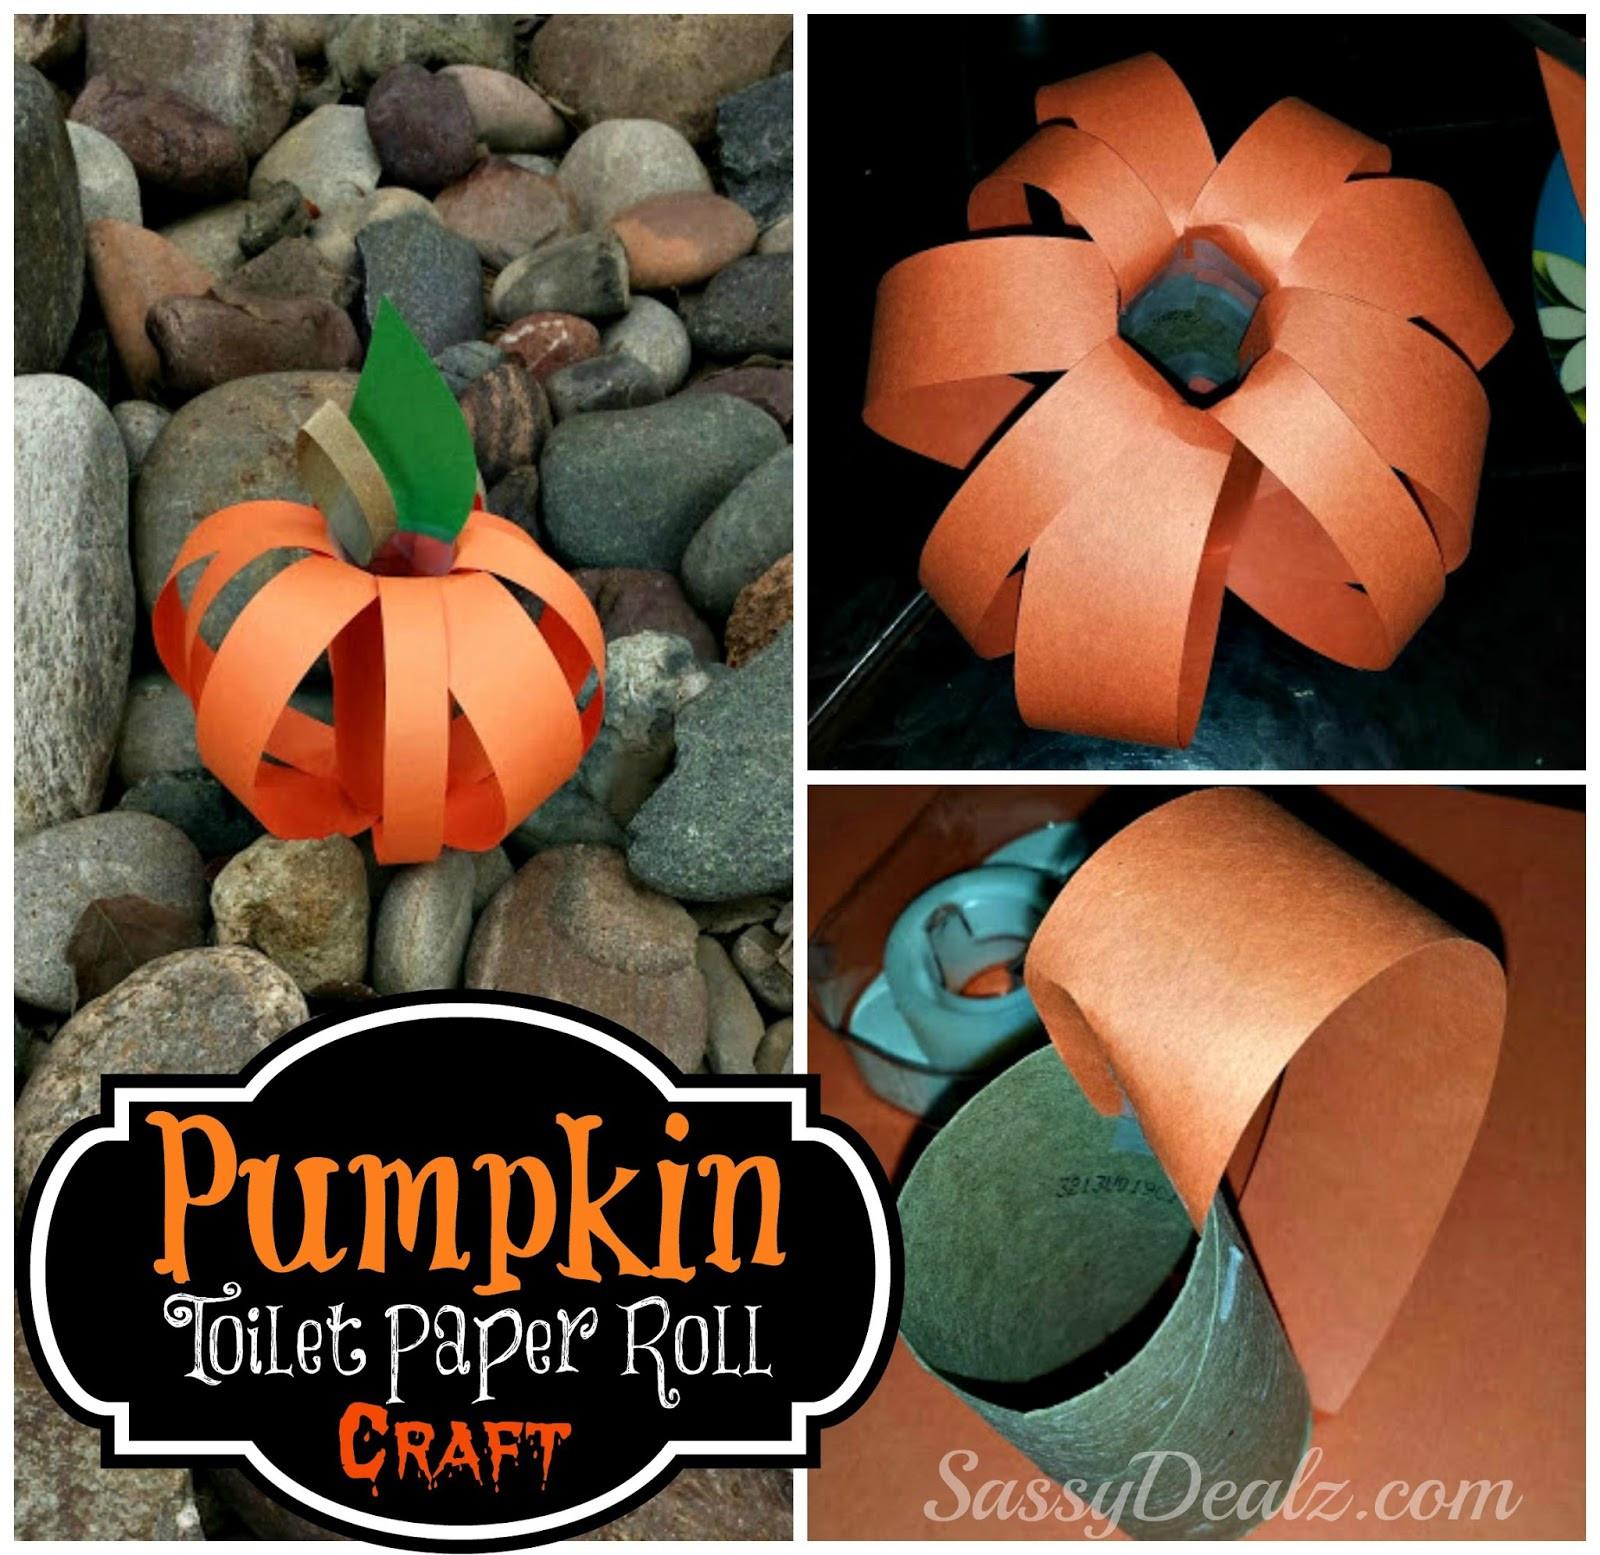 Toilet Paper Roll Crafts Halloween  Pumpkin Toilet Paper Roll Craft For Kids Halloween Idea